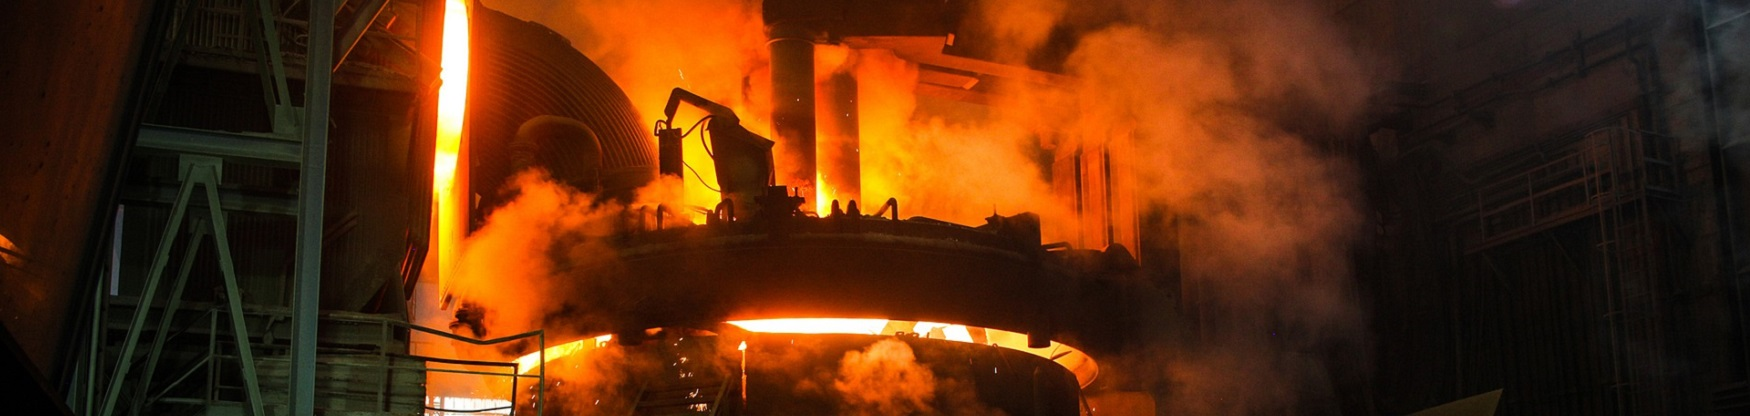 steel_furnace.jpg